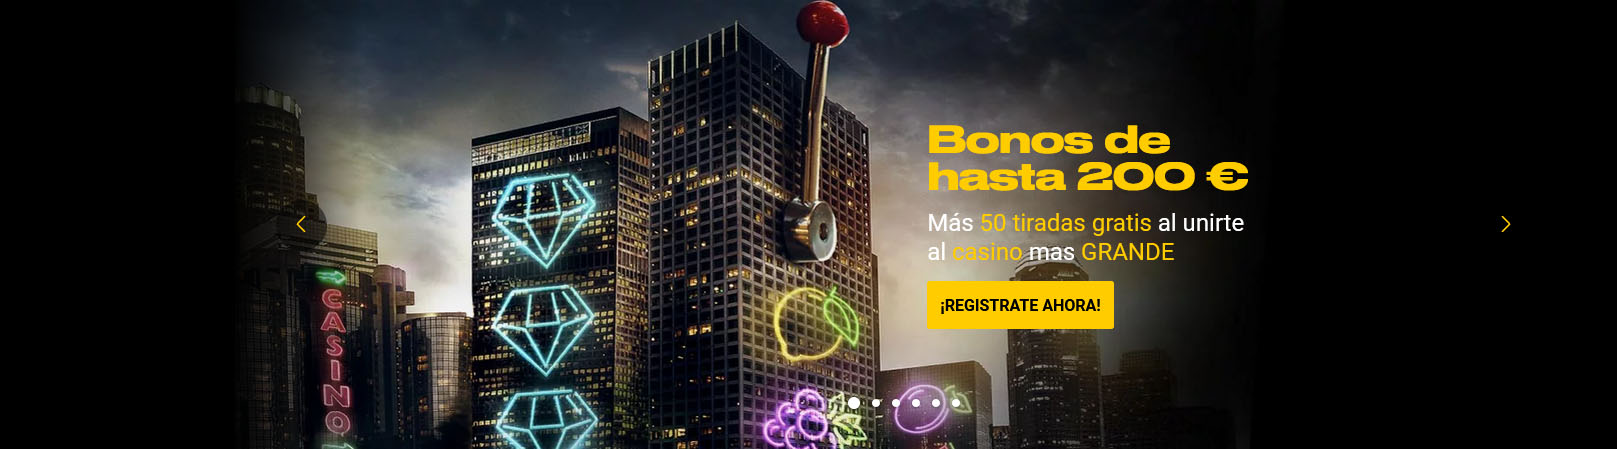 Bono Bienvenida Bwin casino